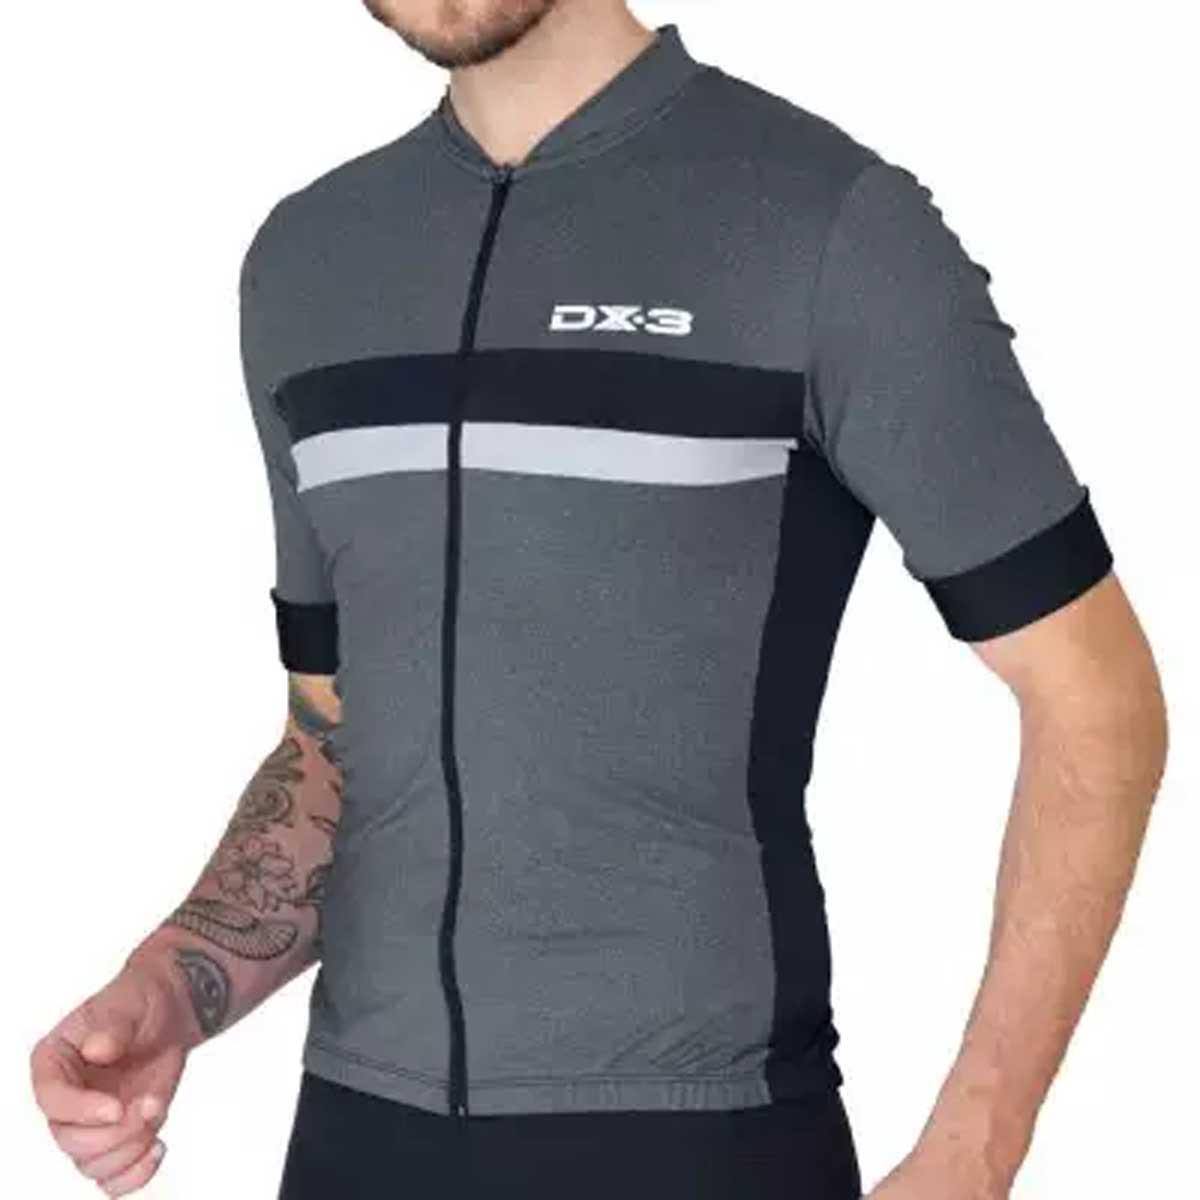 Camisa DX3 Masculina Ultra 05 Mescla e Cinza Ciclismo 21